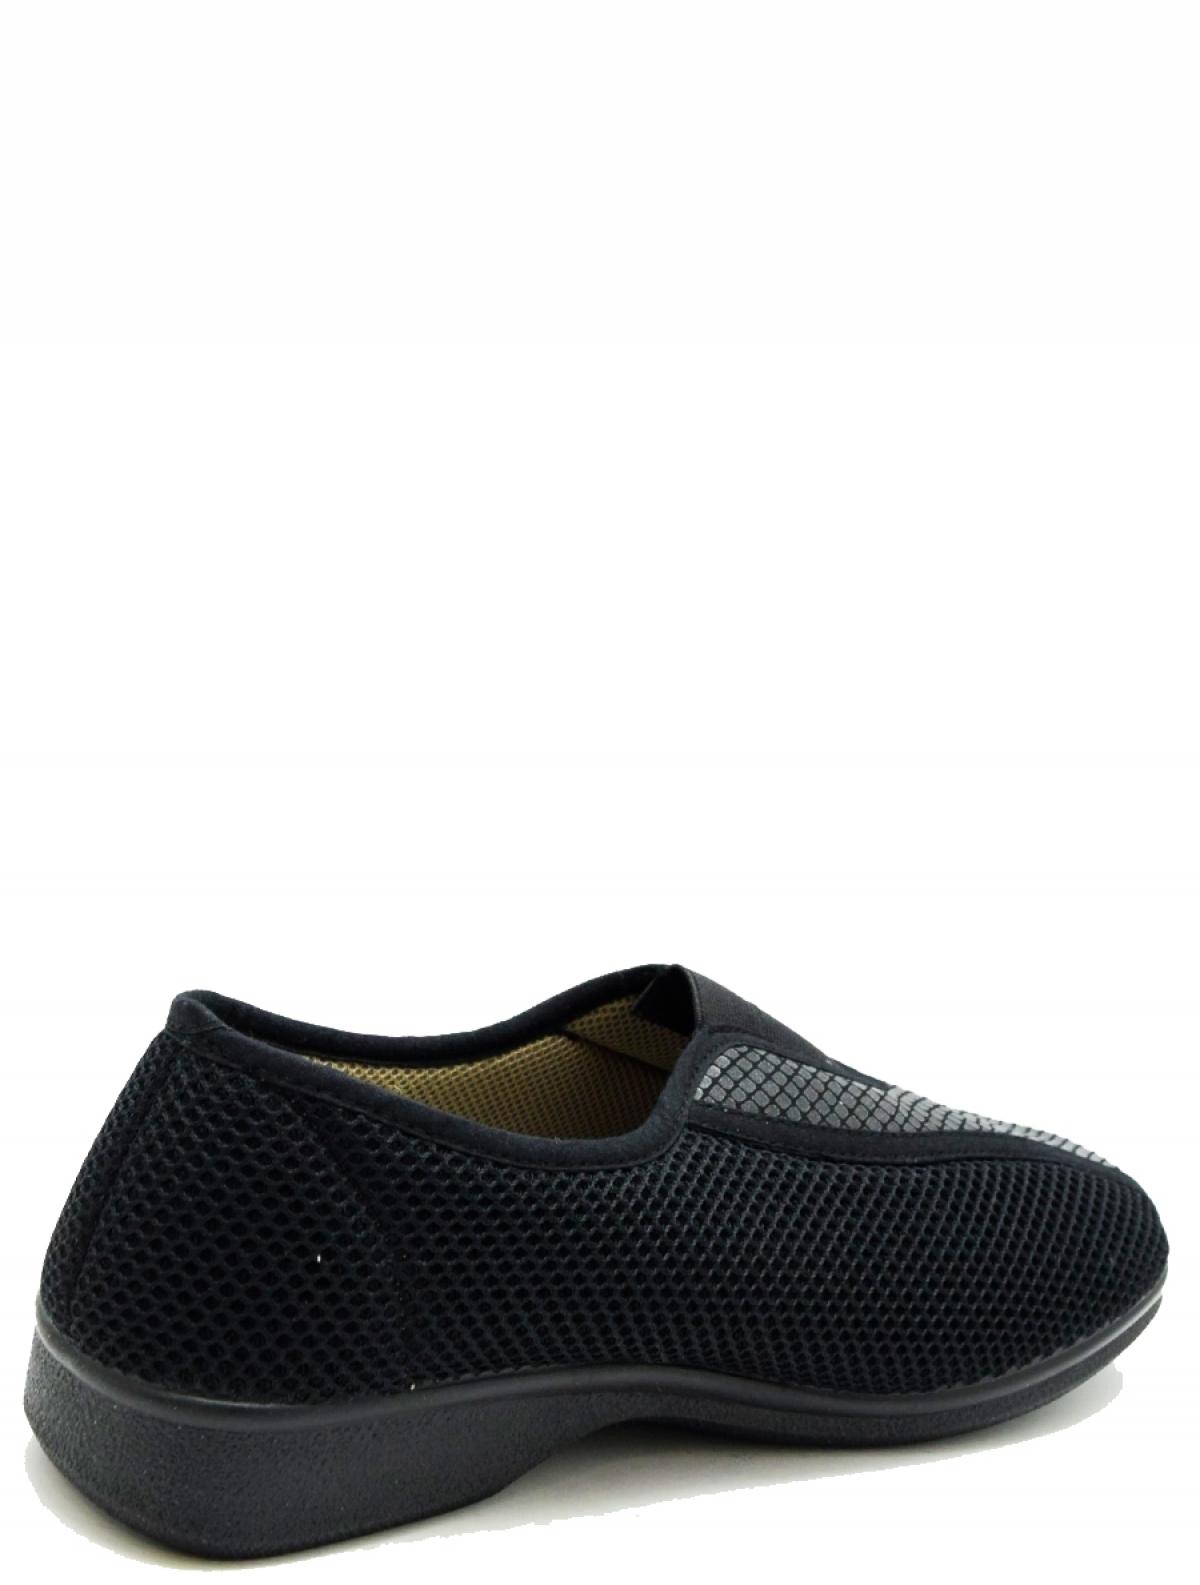 Imara Moda 183-115210-001 женские туфли